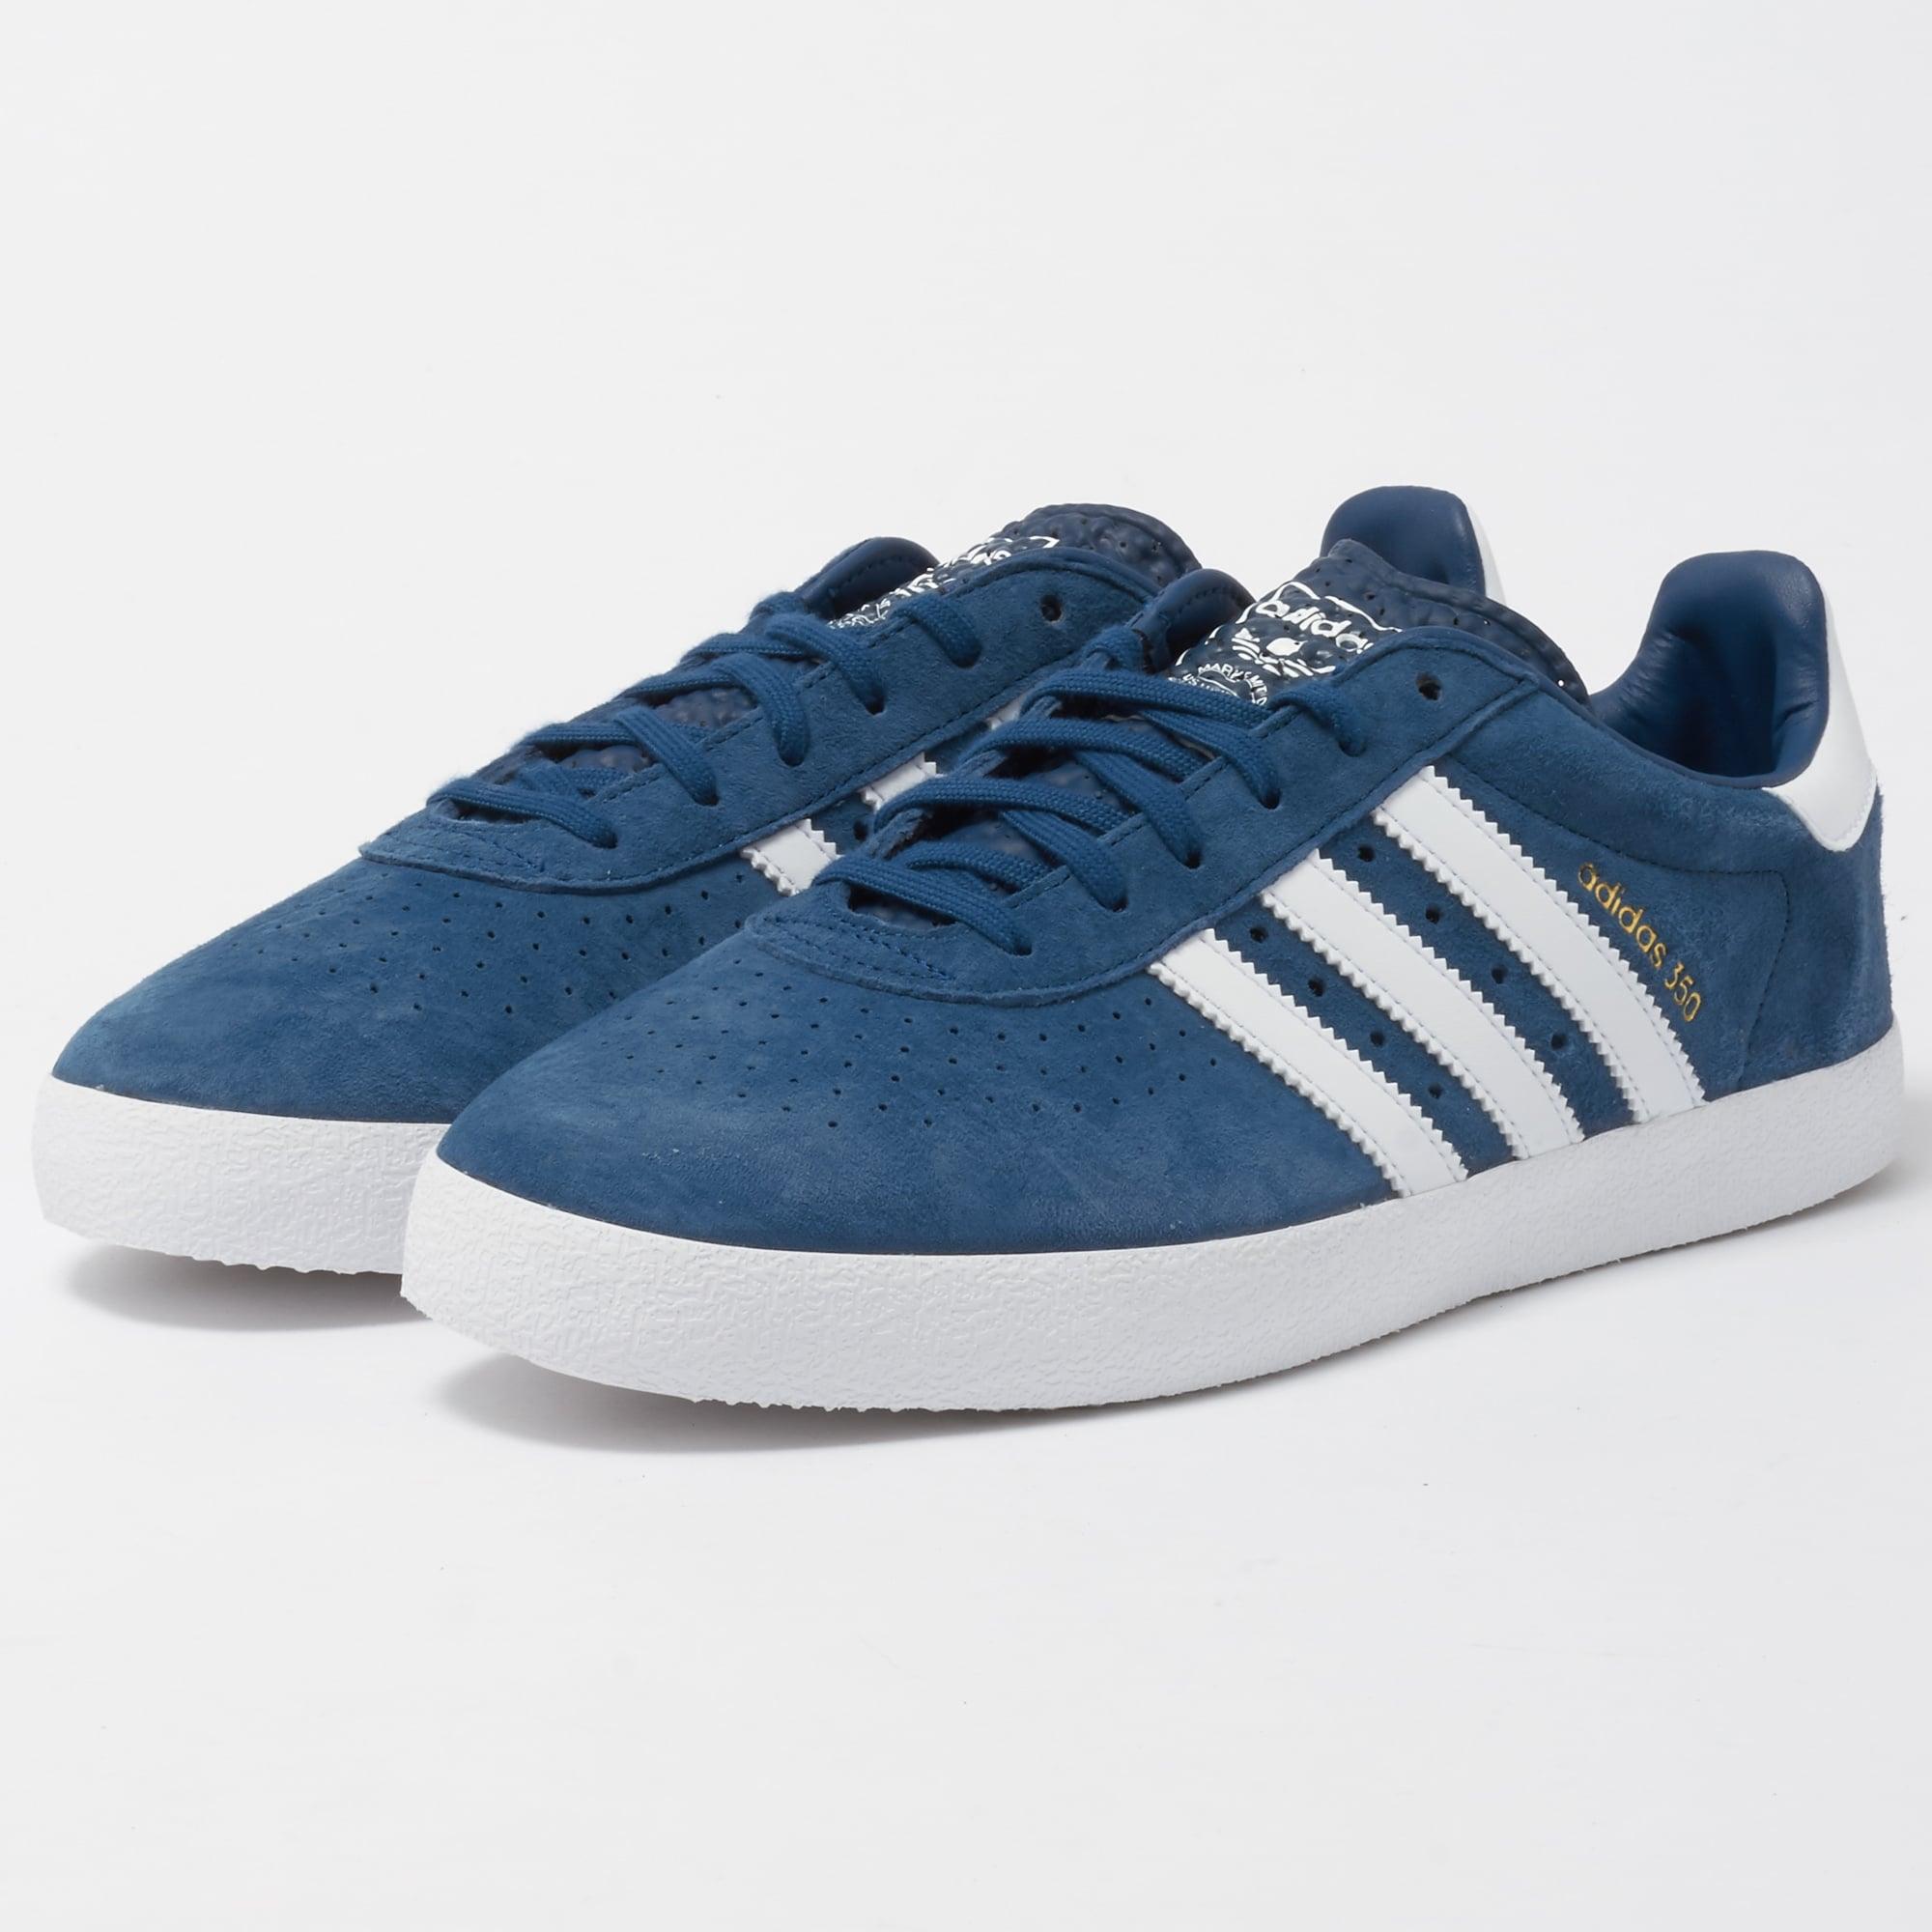 Neue adidas leder 350 männer ausbilder casual schuhe leder adidas blaue nacht by9764 50e1f6